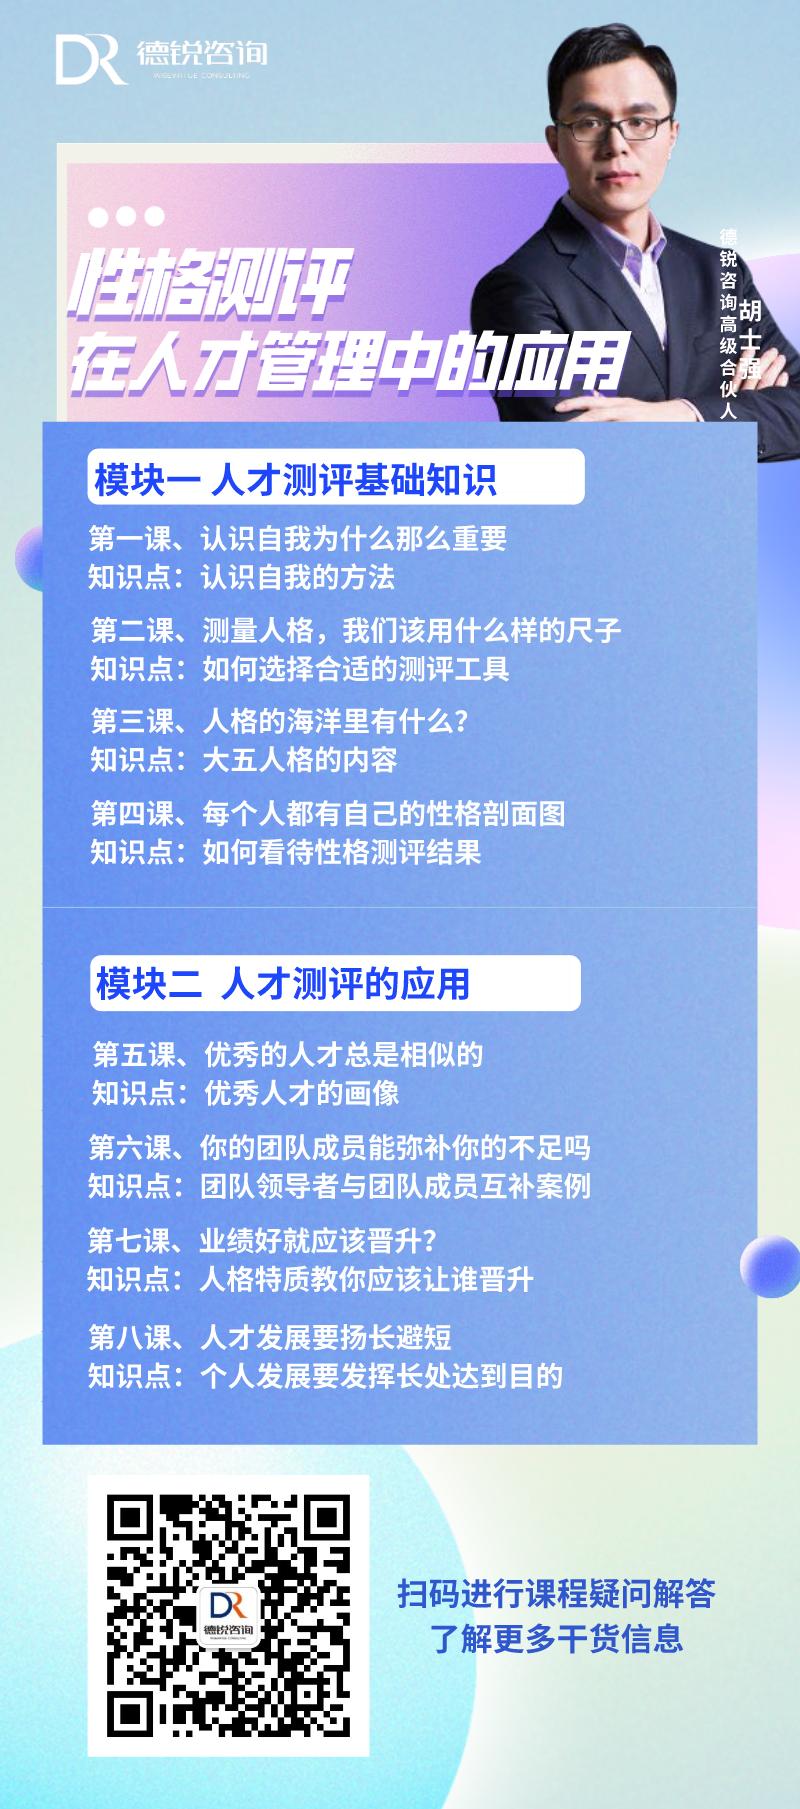 性格测评长图介绍.png